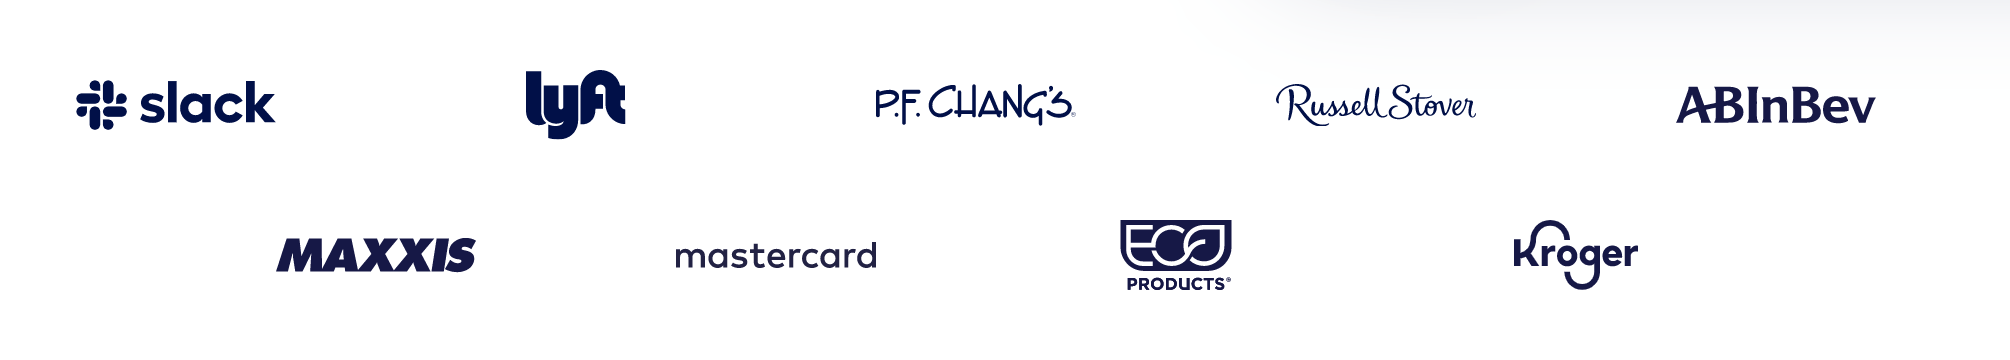 Brandfolder Clients